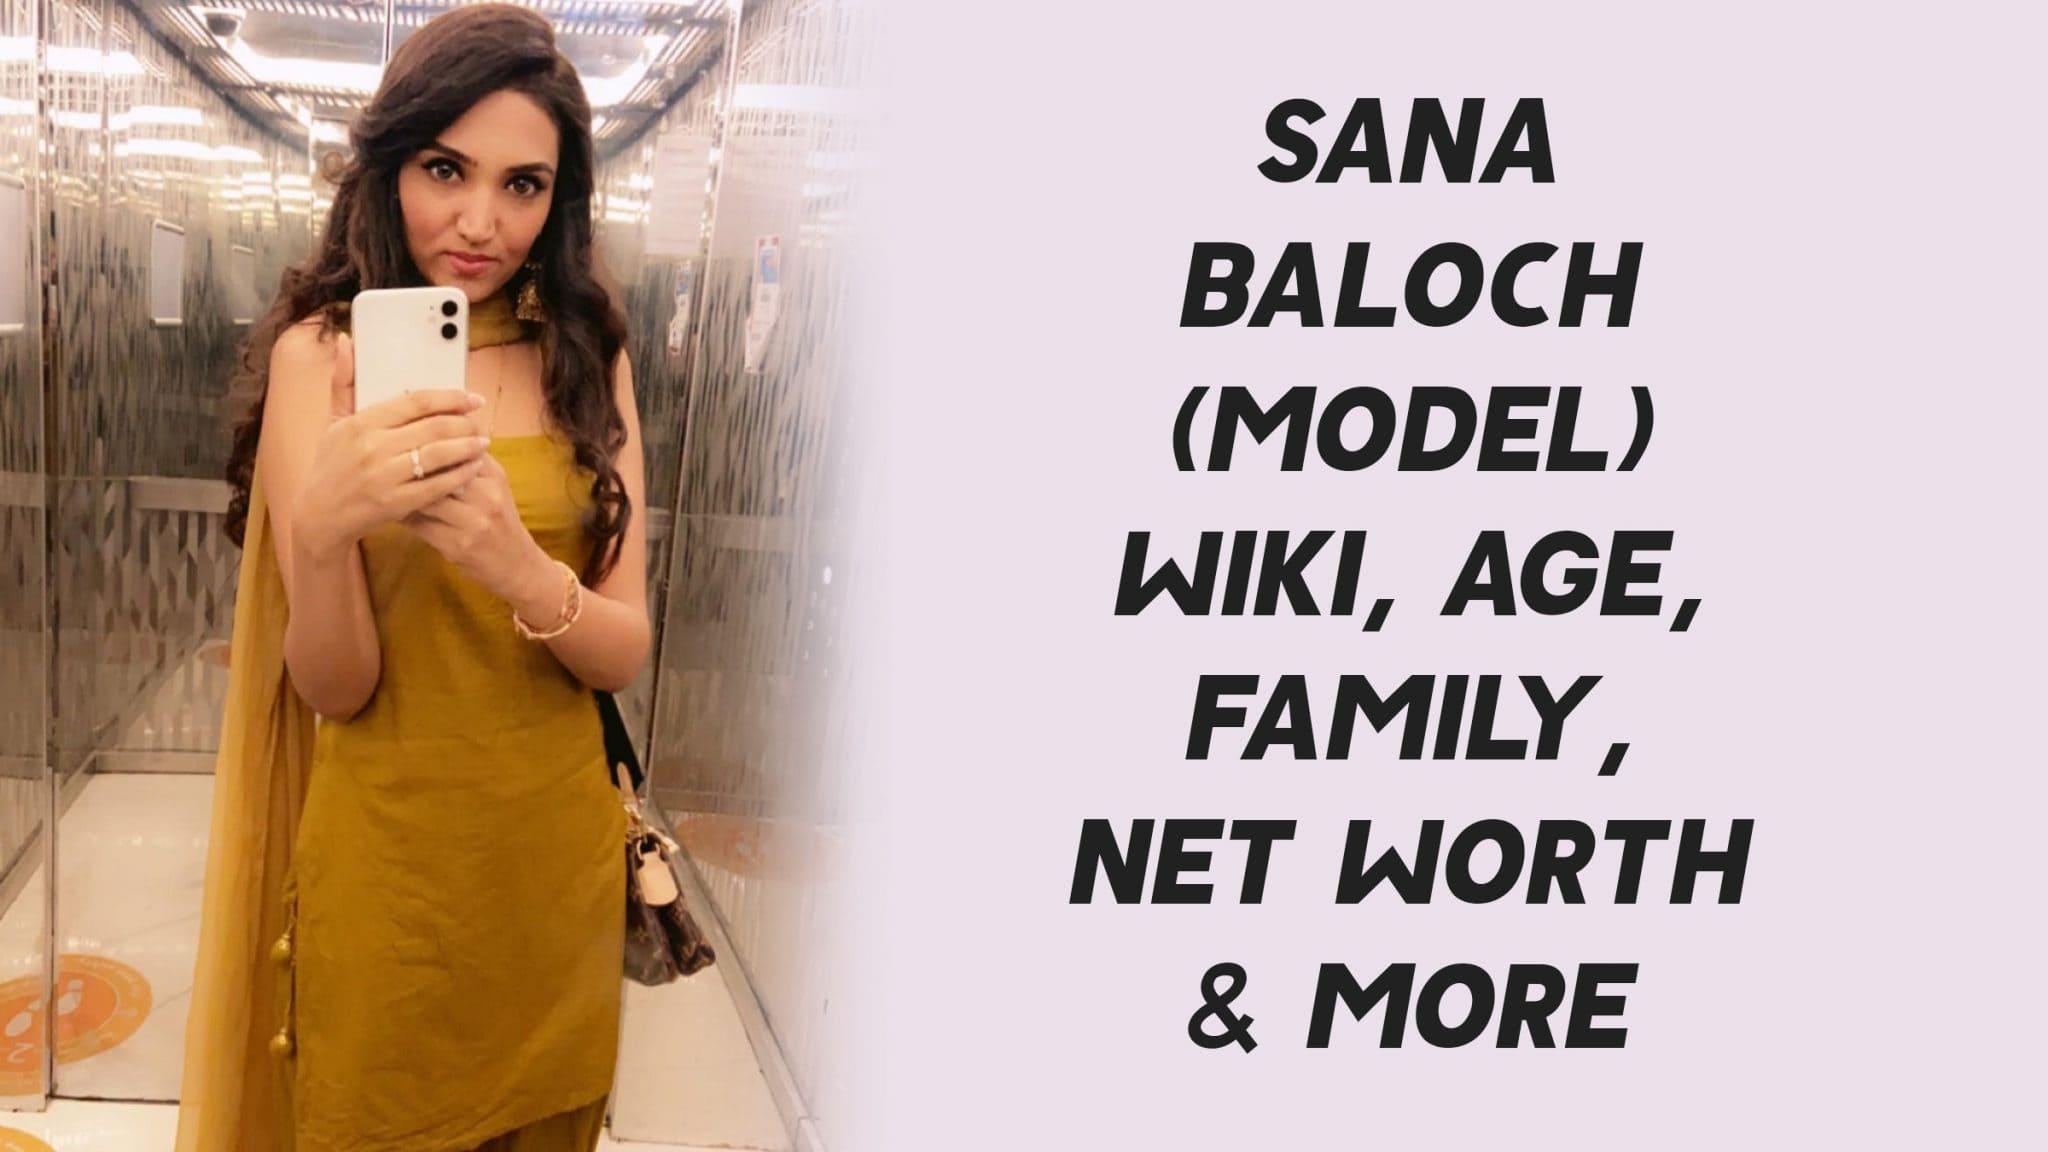 Sana Baloch (Model) Wiki, Age, Family, Net Worth & More 1